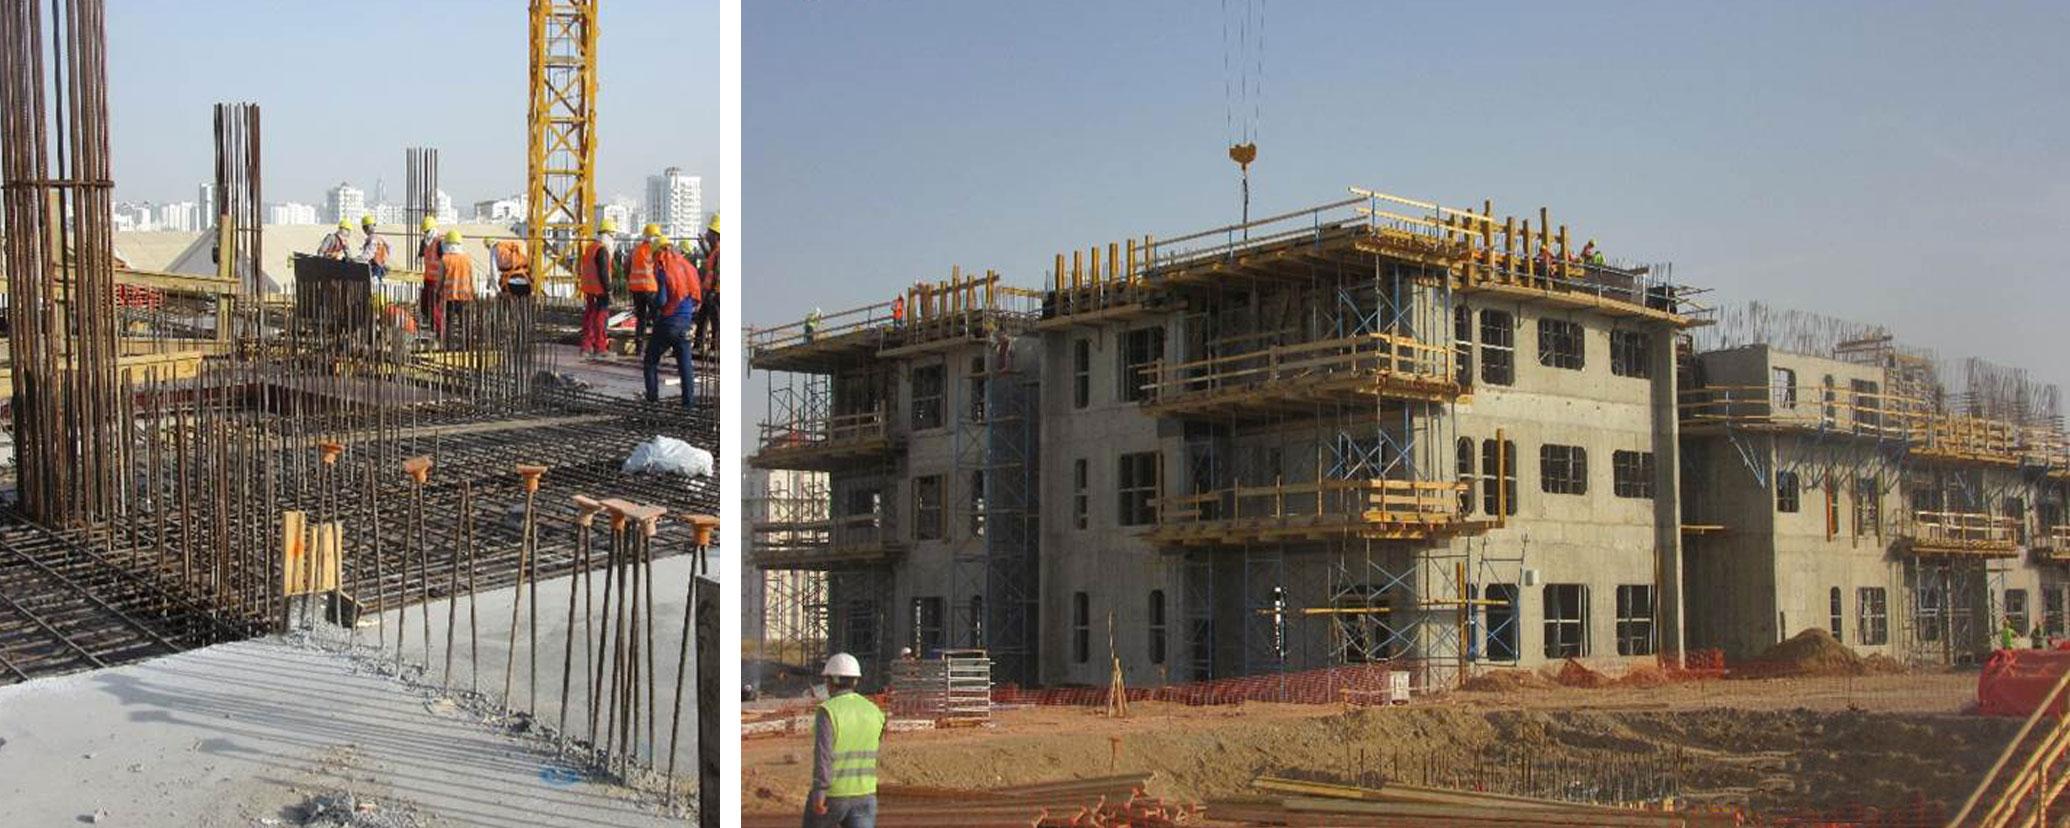 U S Embassy Ashgabat Turkmenistan Caddell Construction